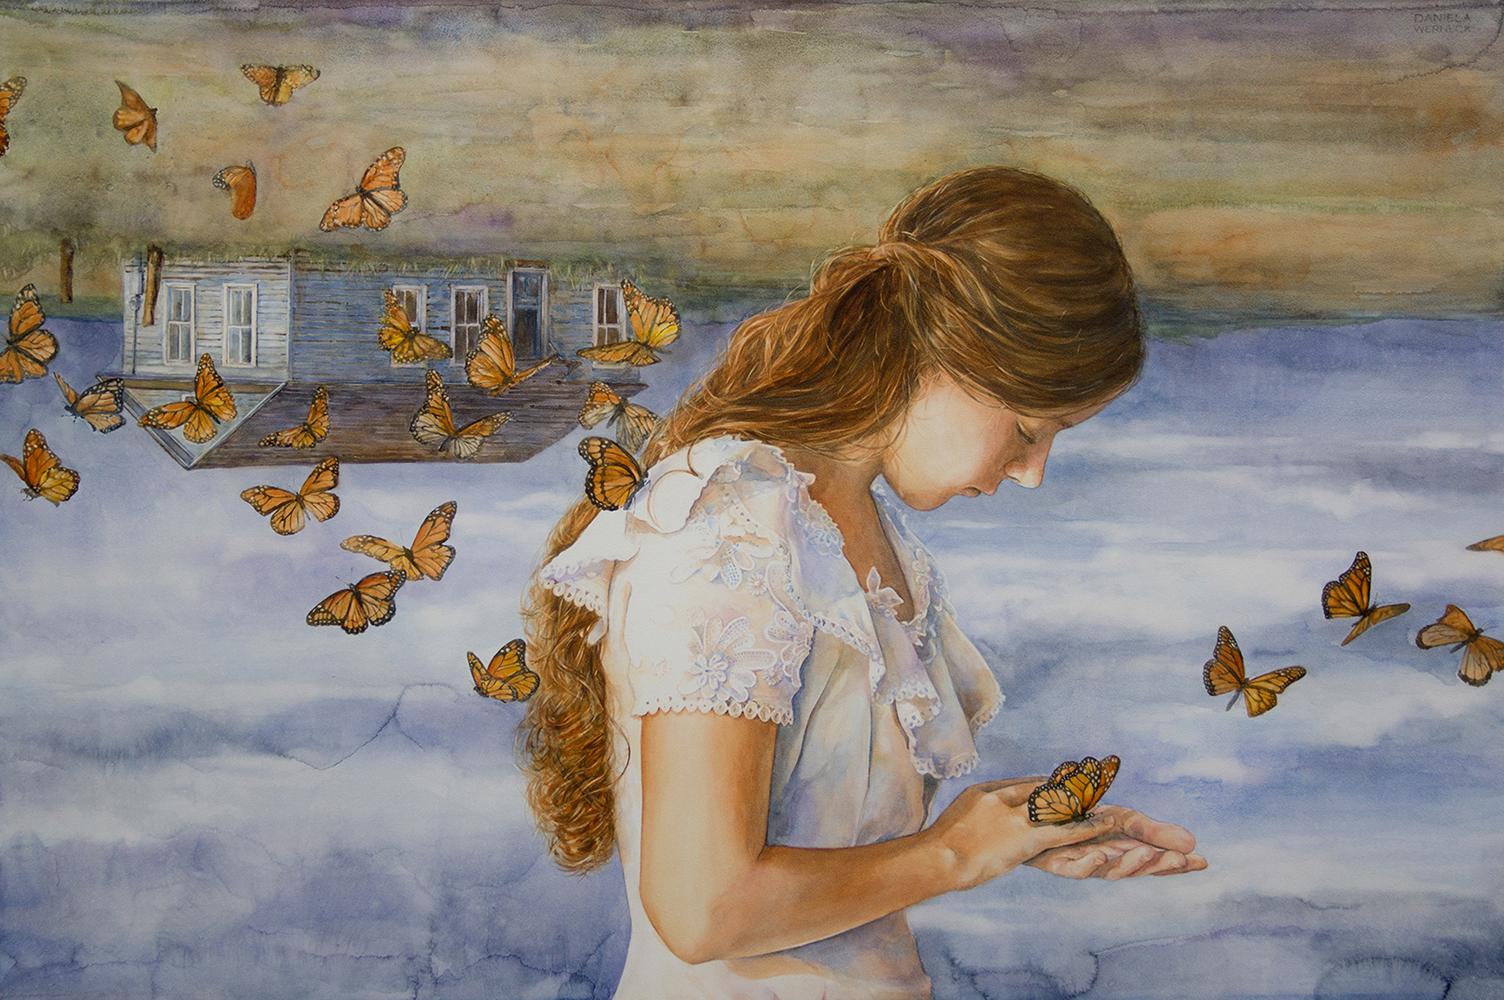 Daniela Werneck's Dreamer